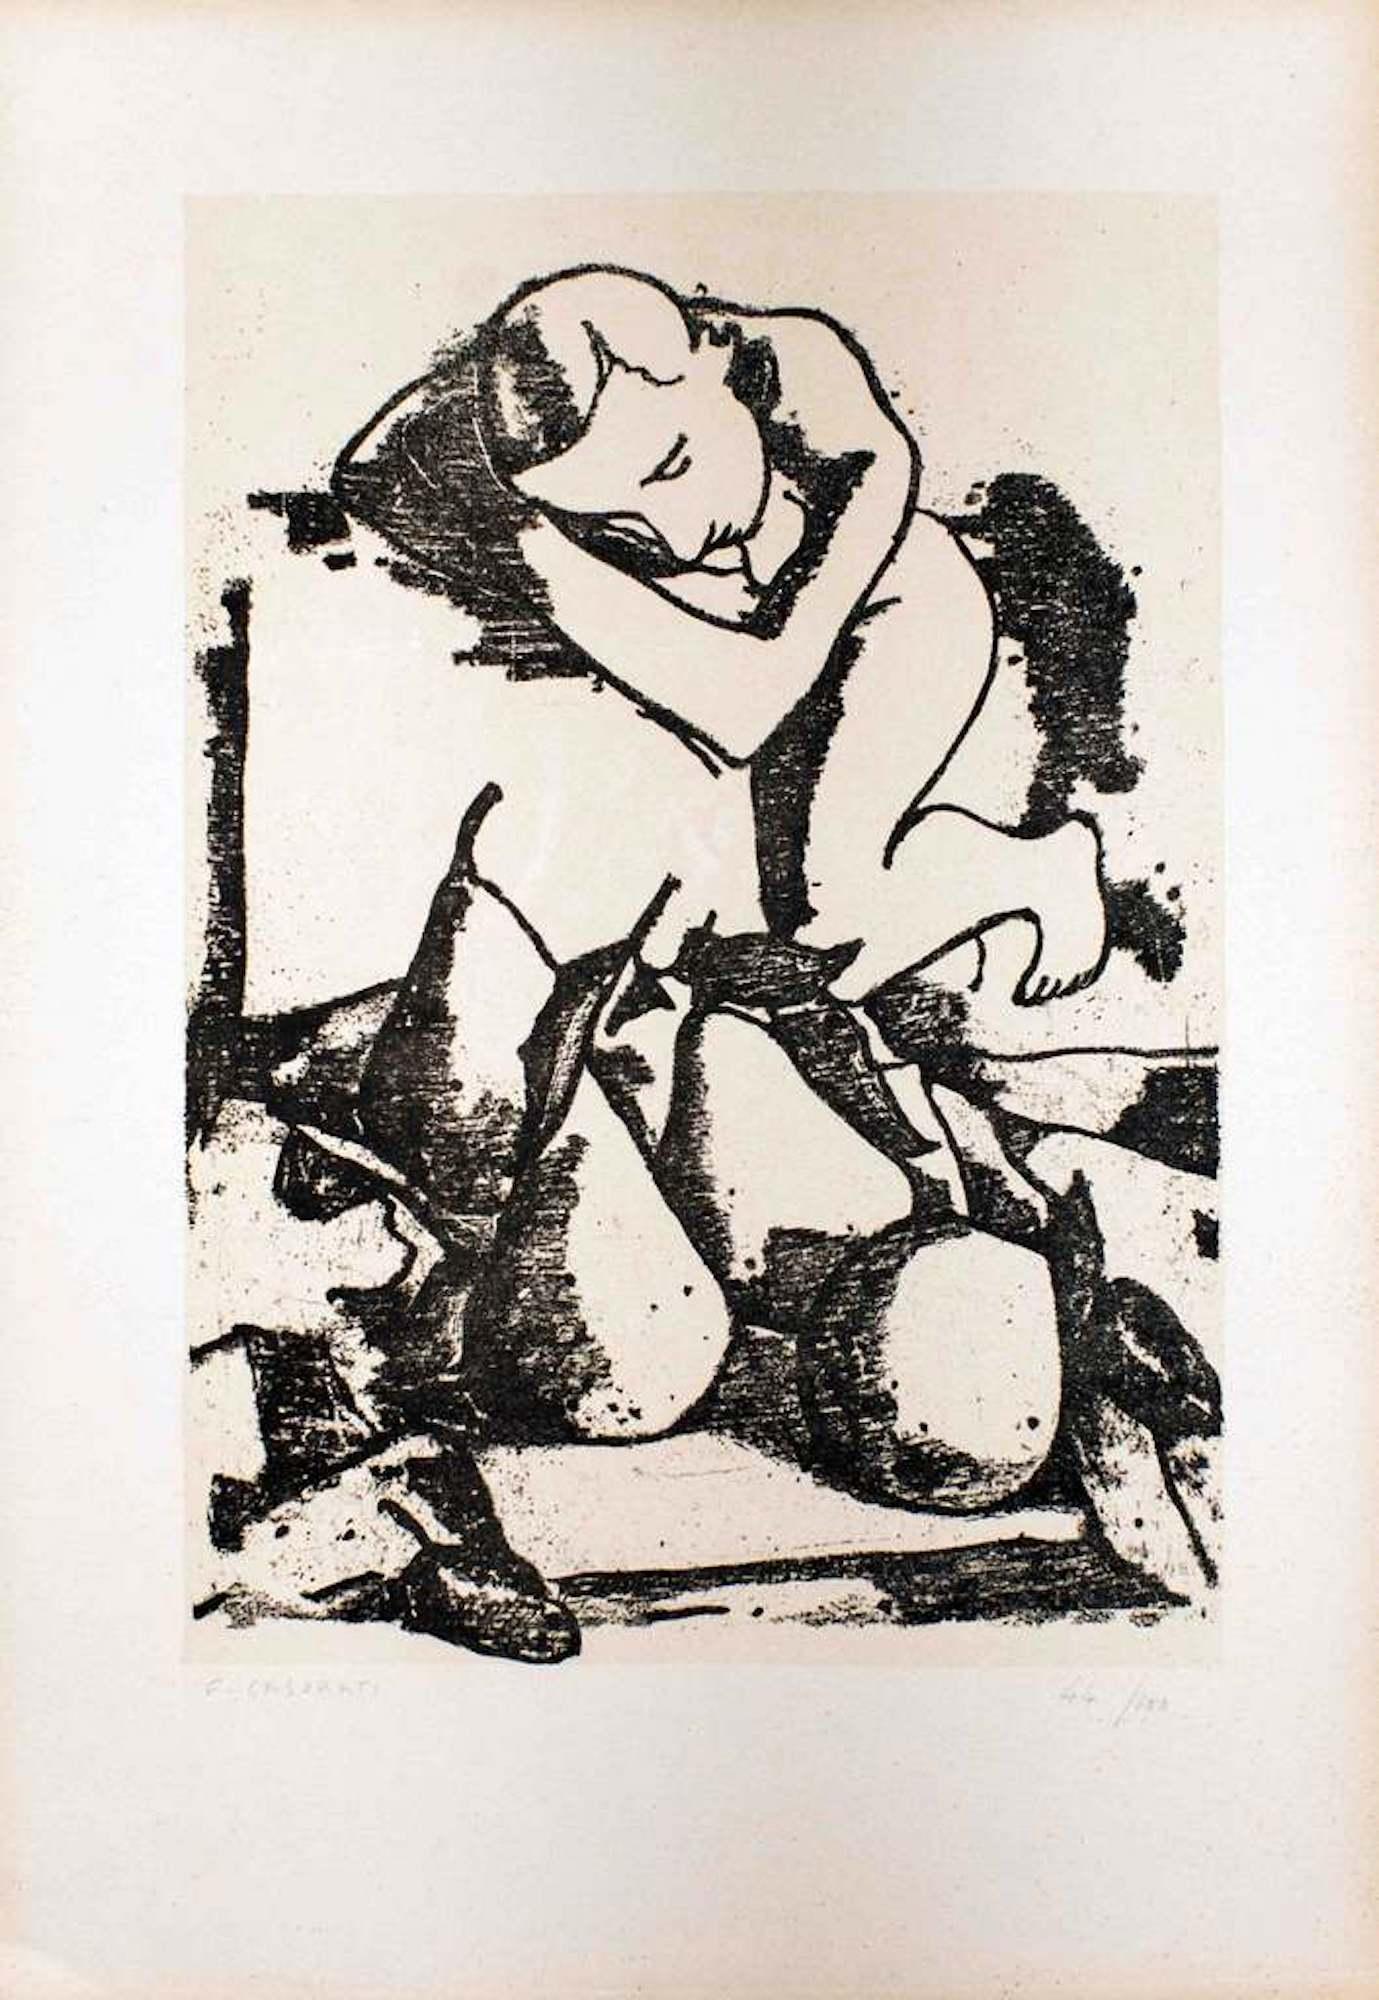 Sleeping Figure - Original Lithograph by Felice Casorati - 1946